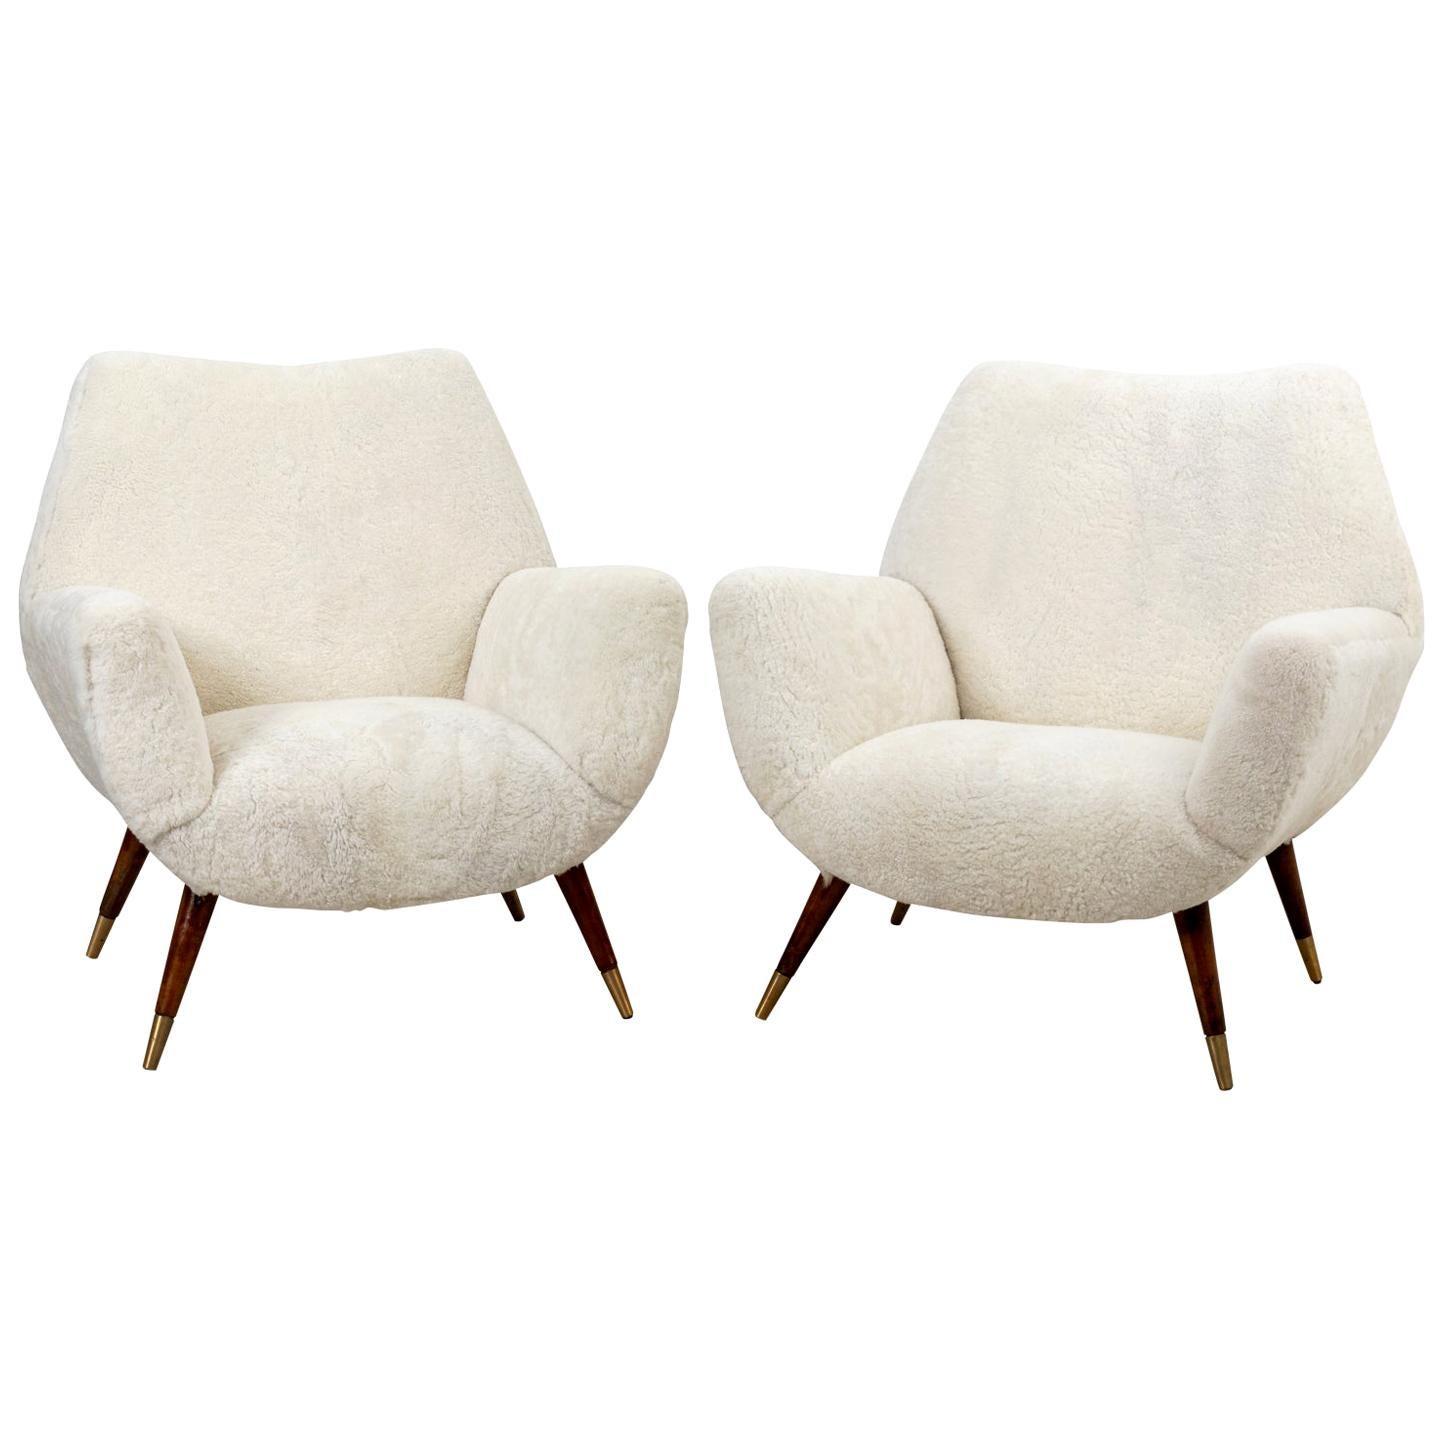 Pair of Midcentury Italian Lamb Shearling Chairs